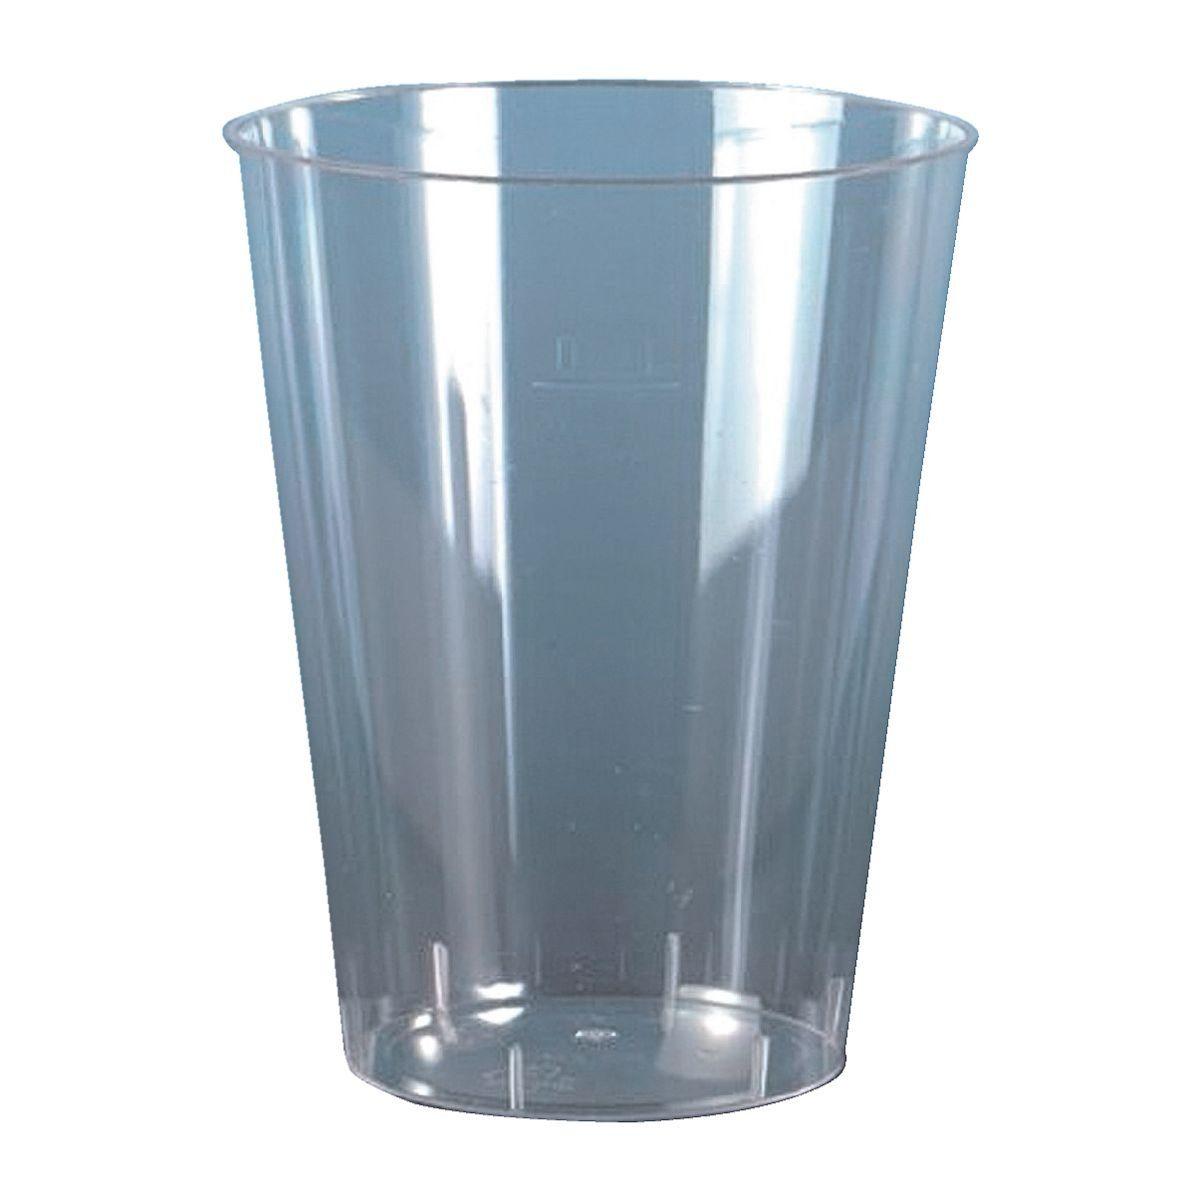 PAPSTAR Einweg-Trinkbecher 0,3L glasklar